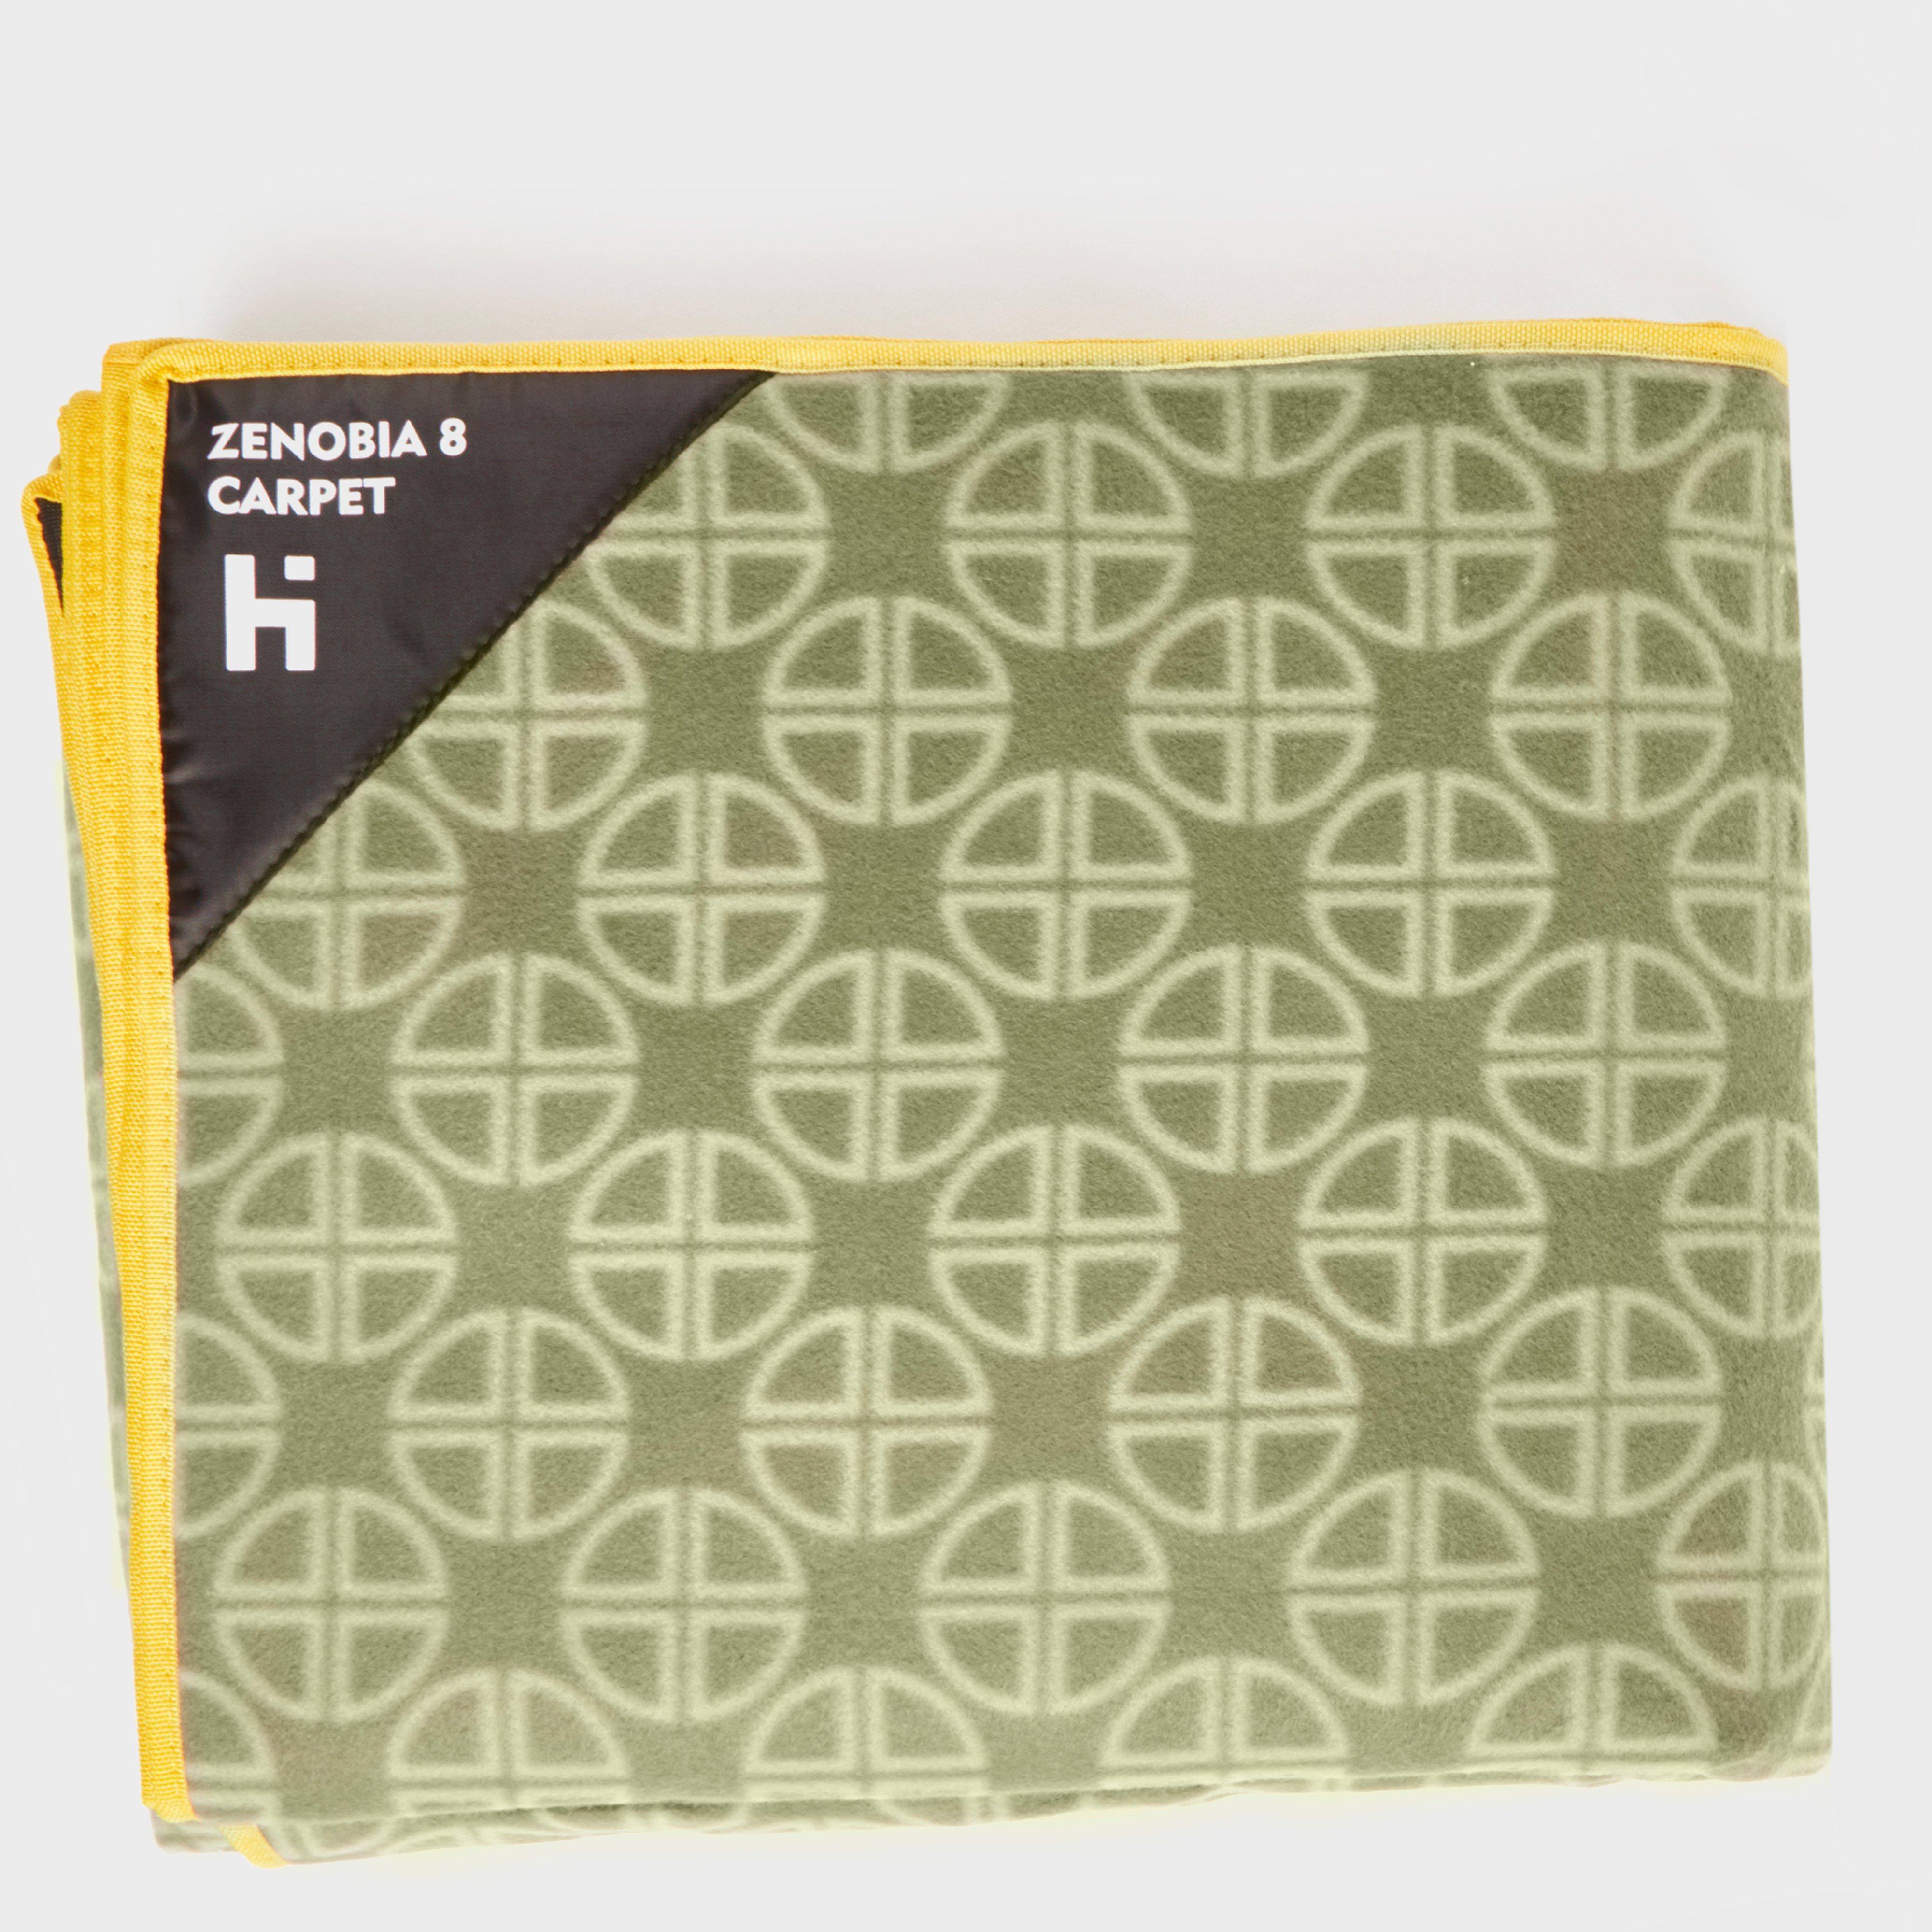 Hi-gear Hg Zenobia 8 Carpet - Grey/gry  Grey/gry